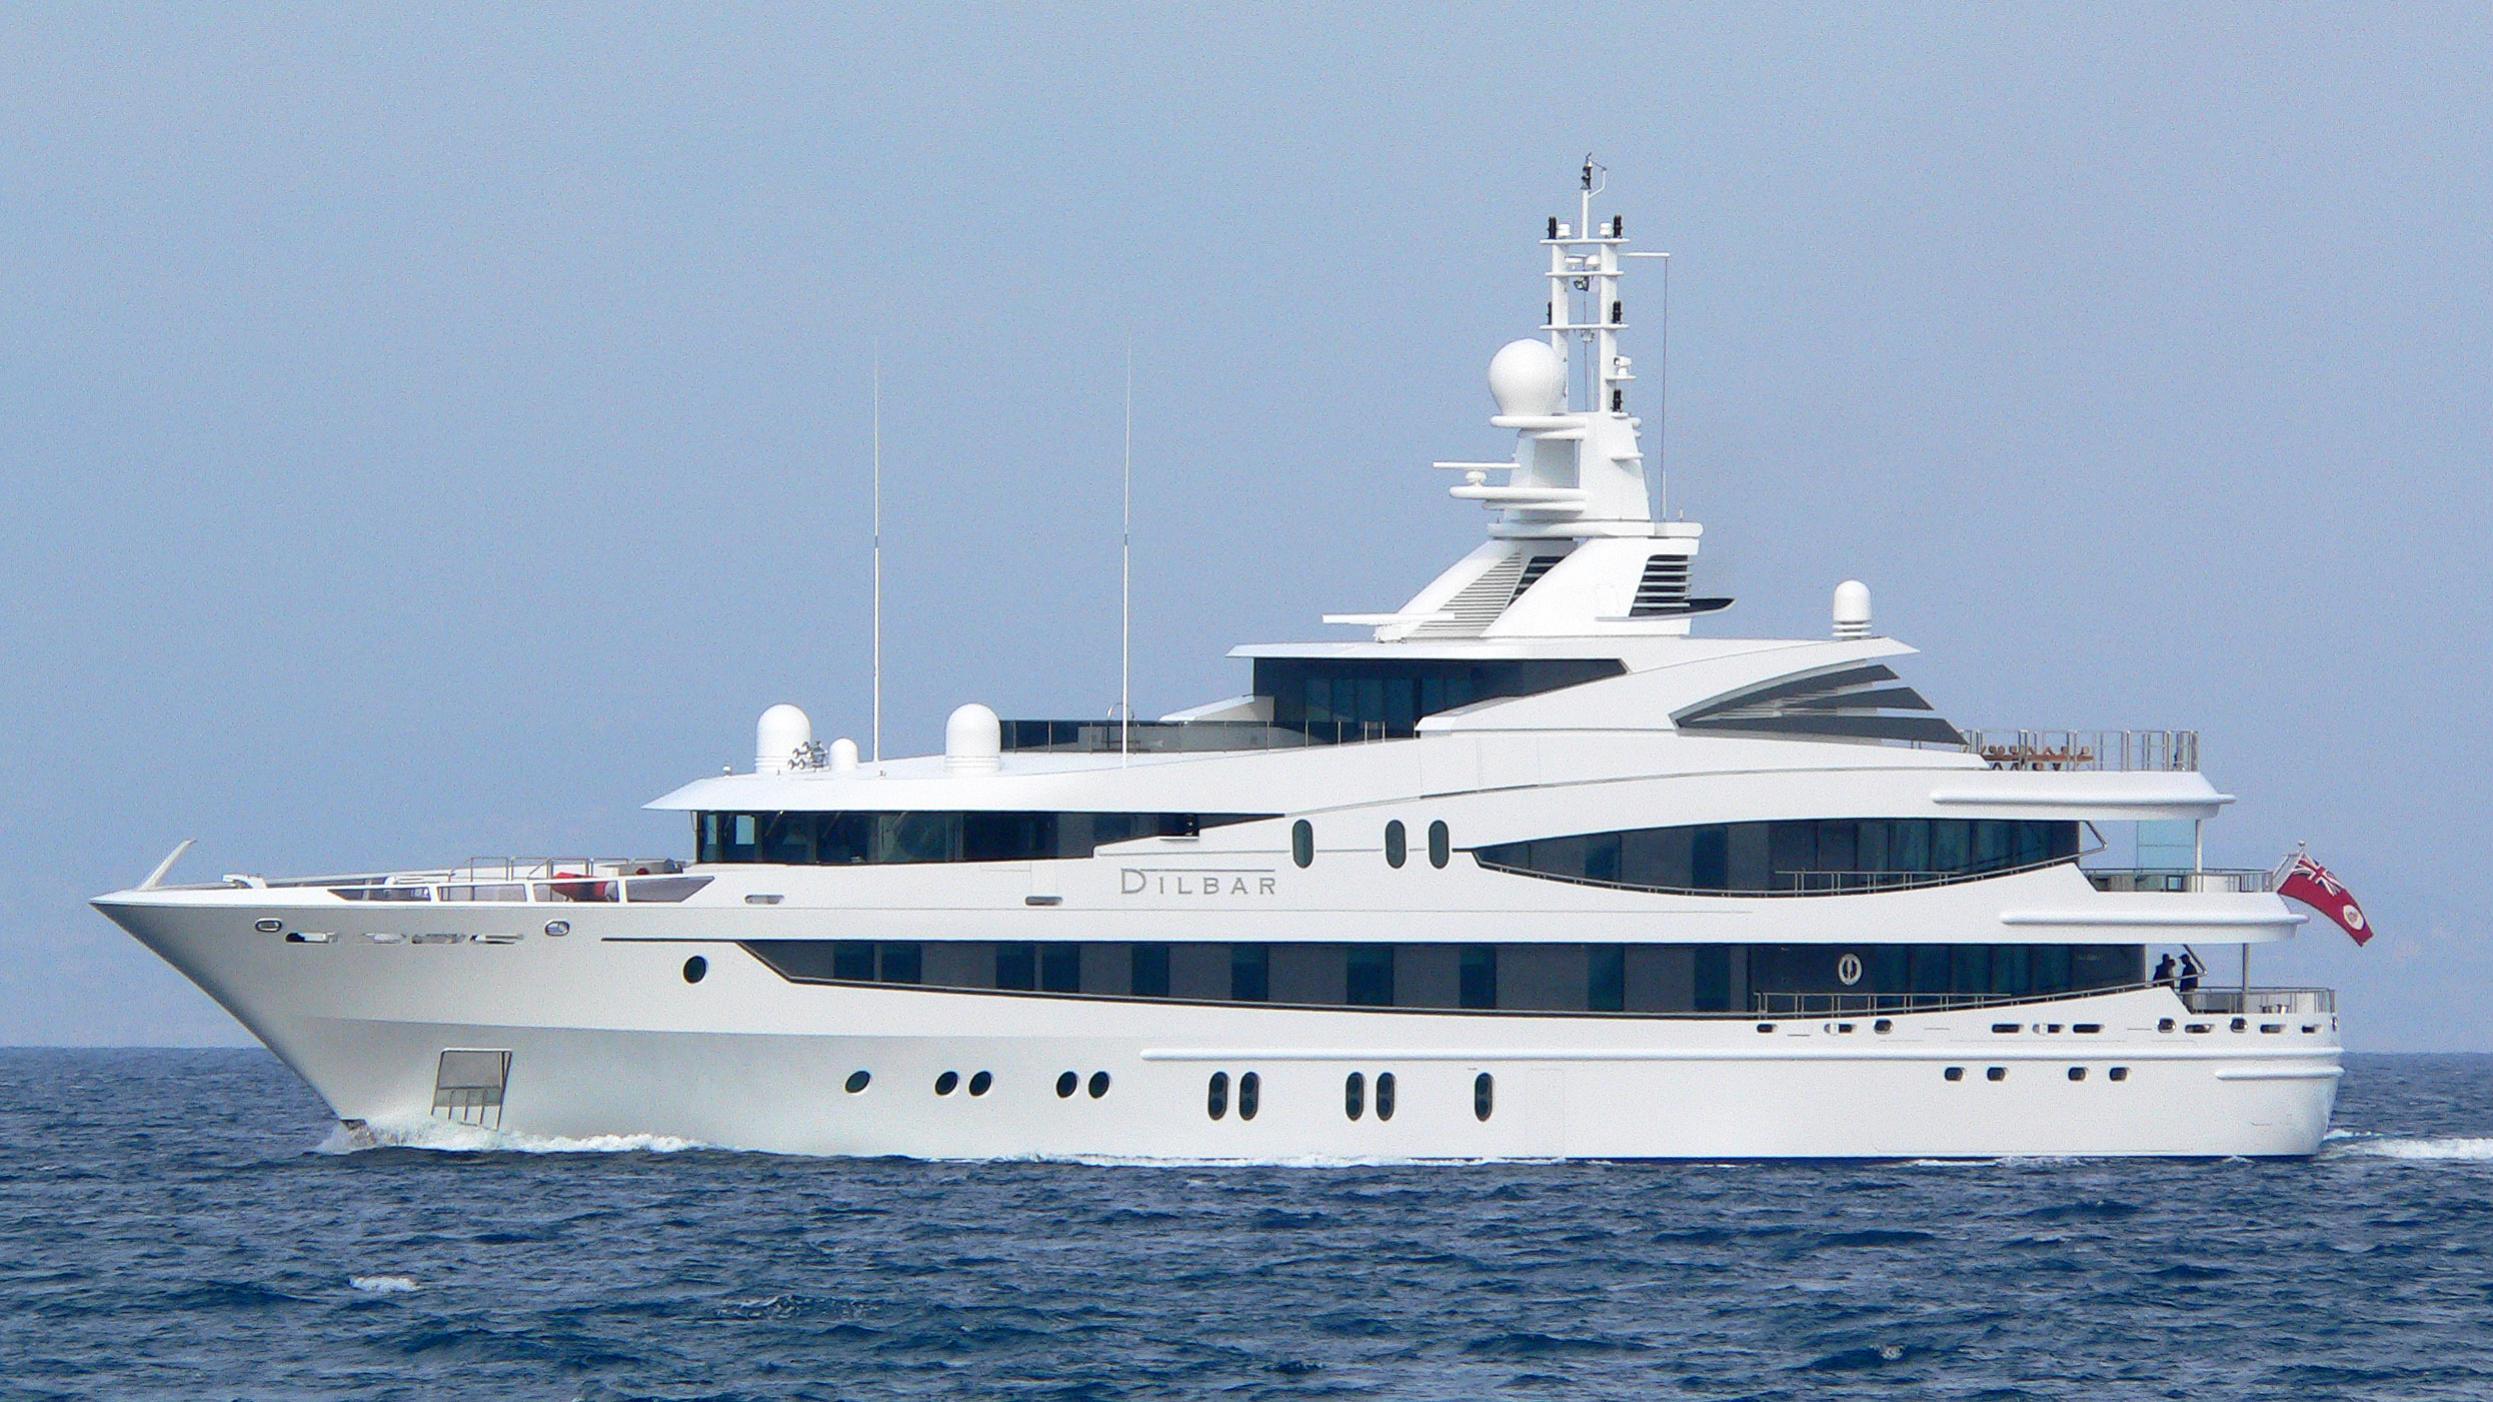 luna b natita motoryacht oceanco 2005 66m profile